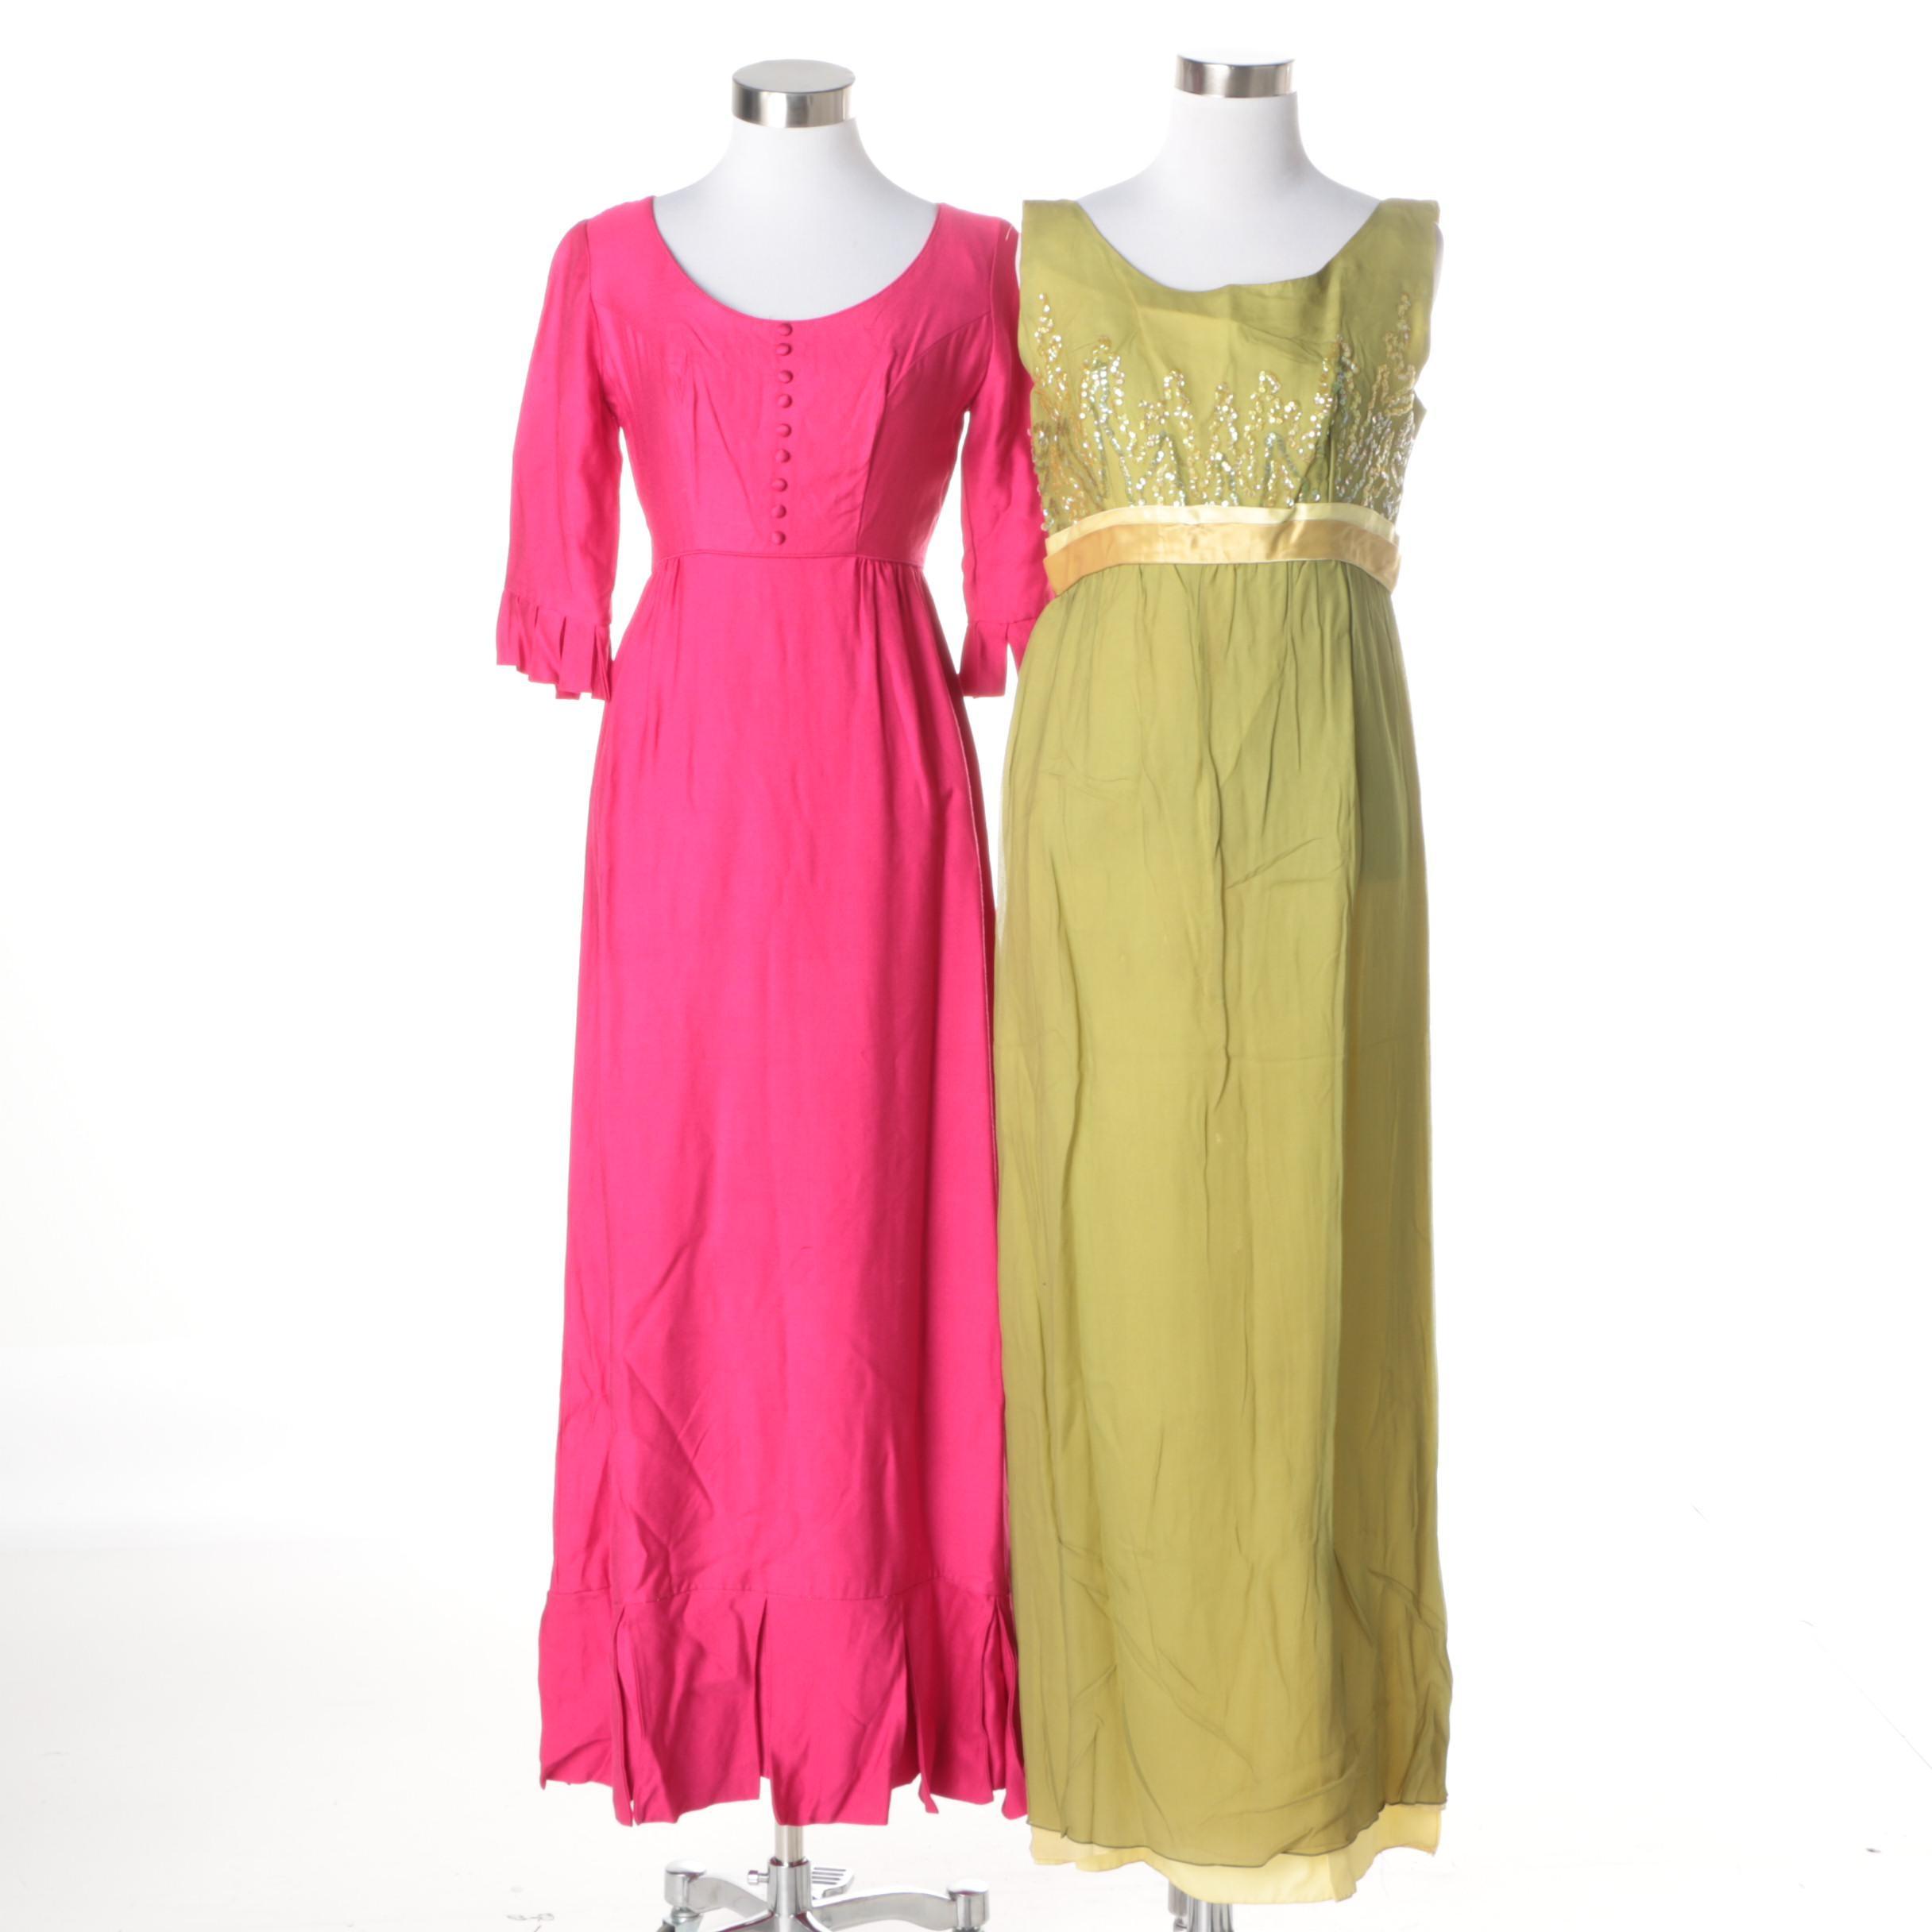 Circa 1960s Vintage Dresses